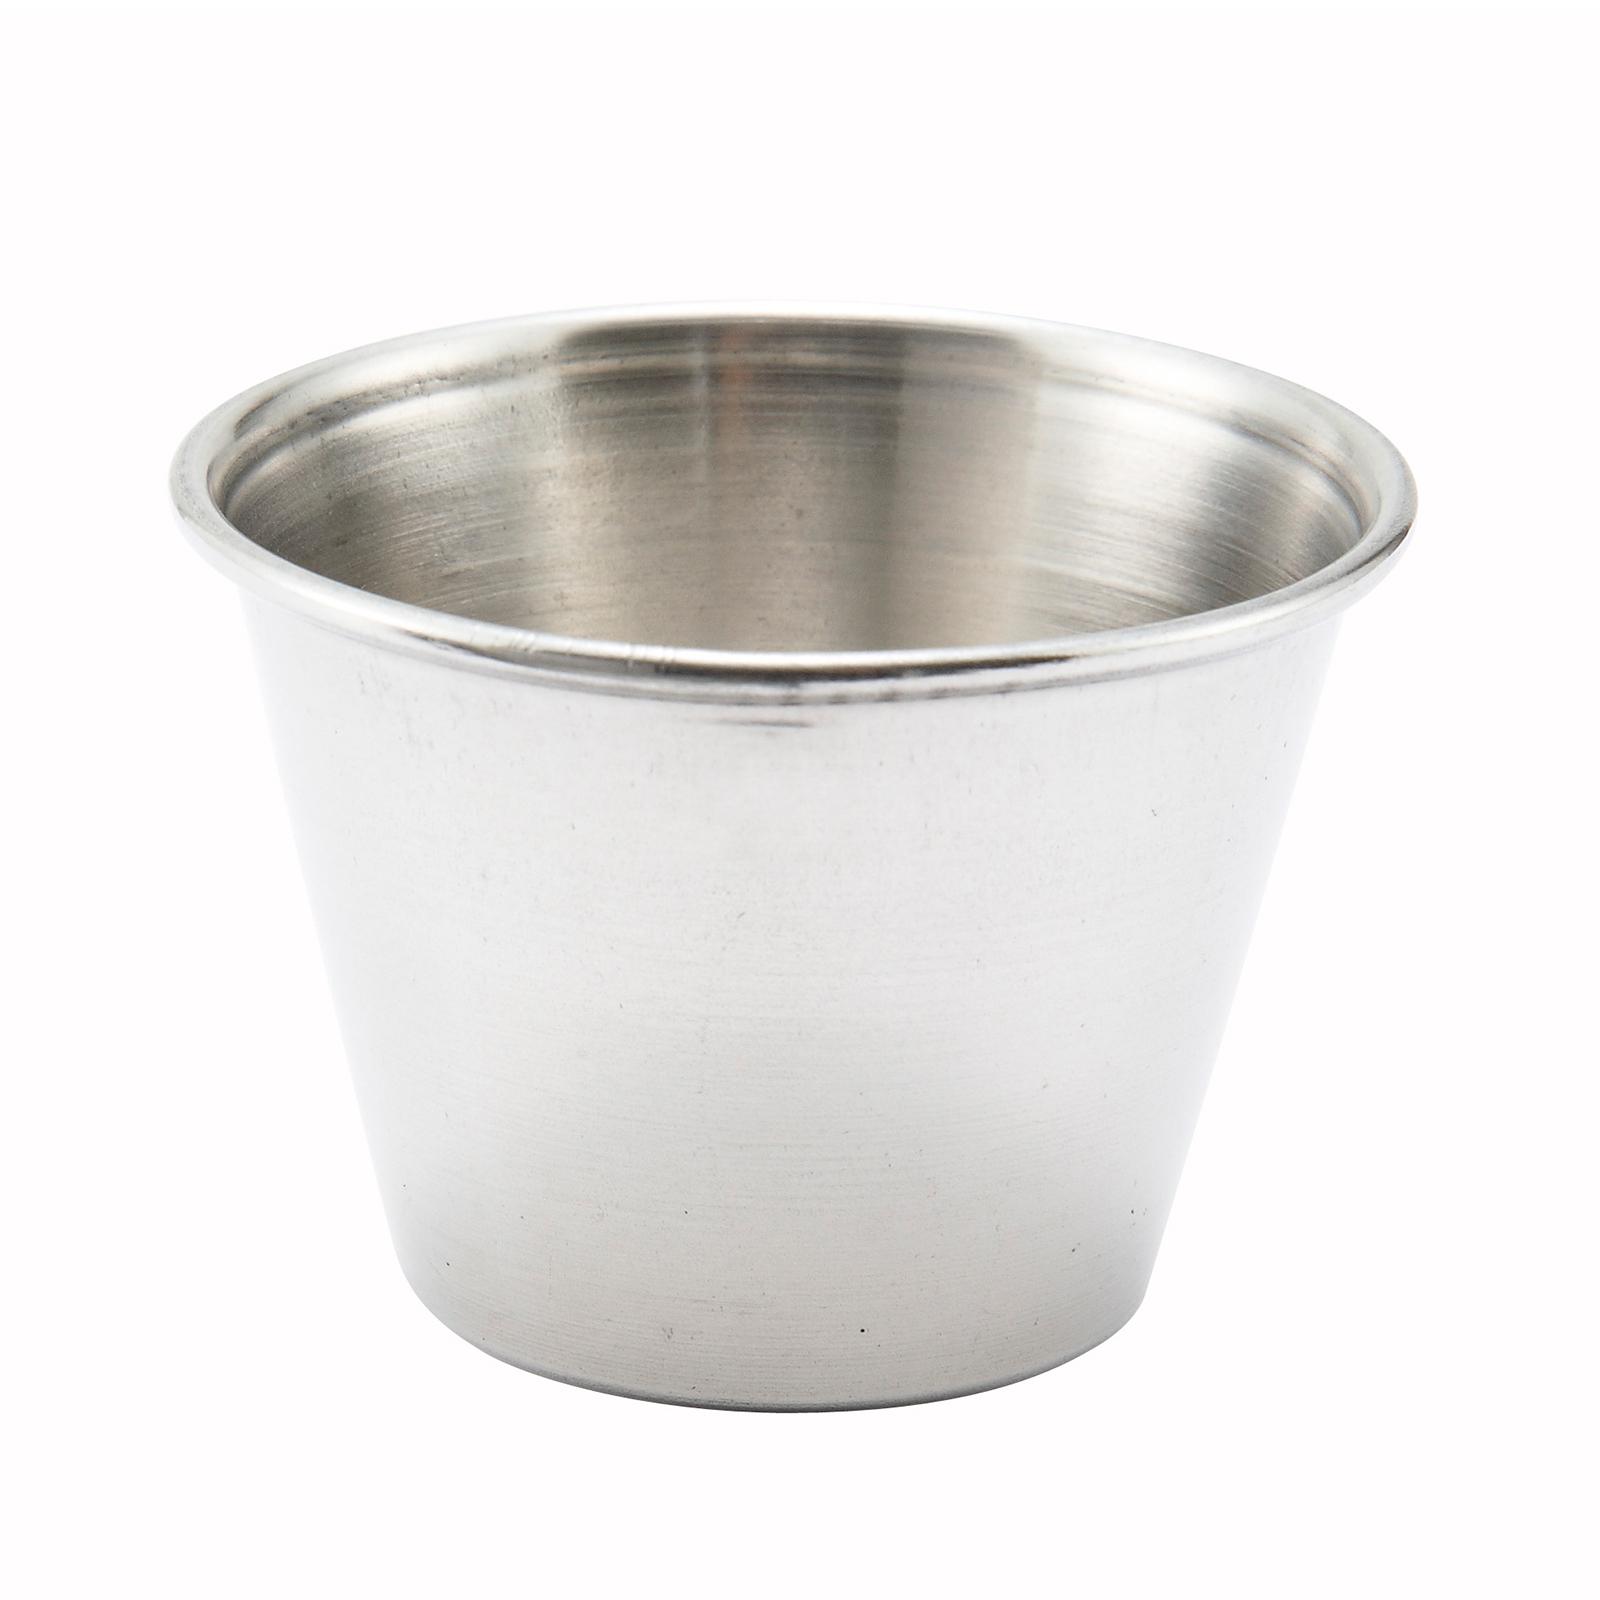 Winco SCP-25 ramekin / sauce cup, metal